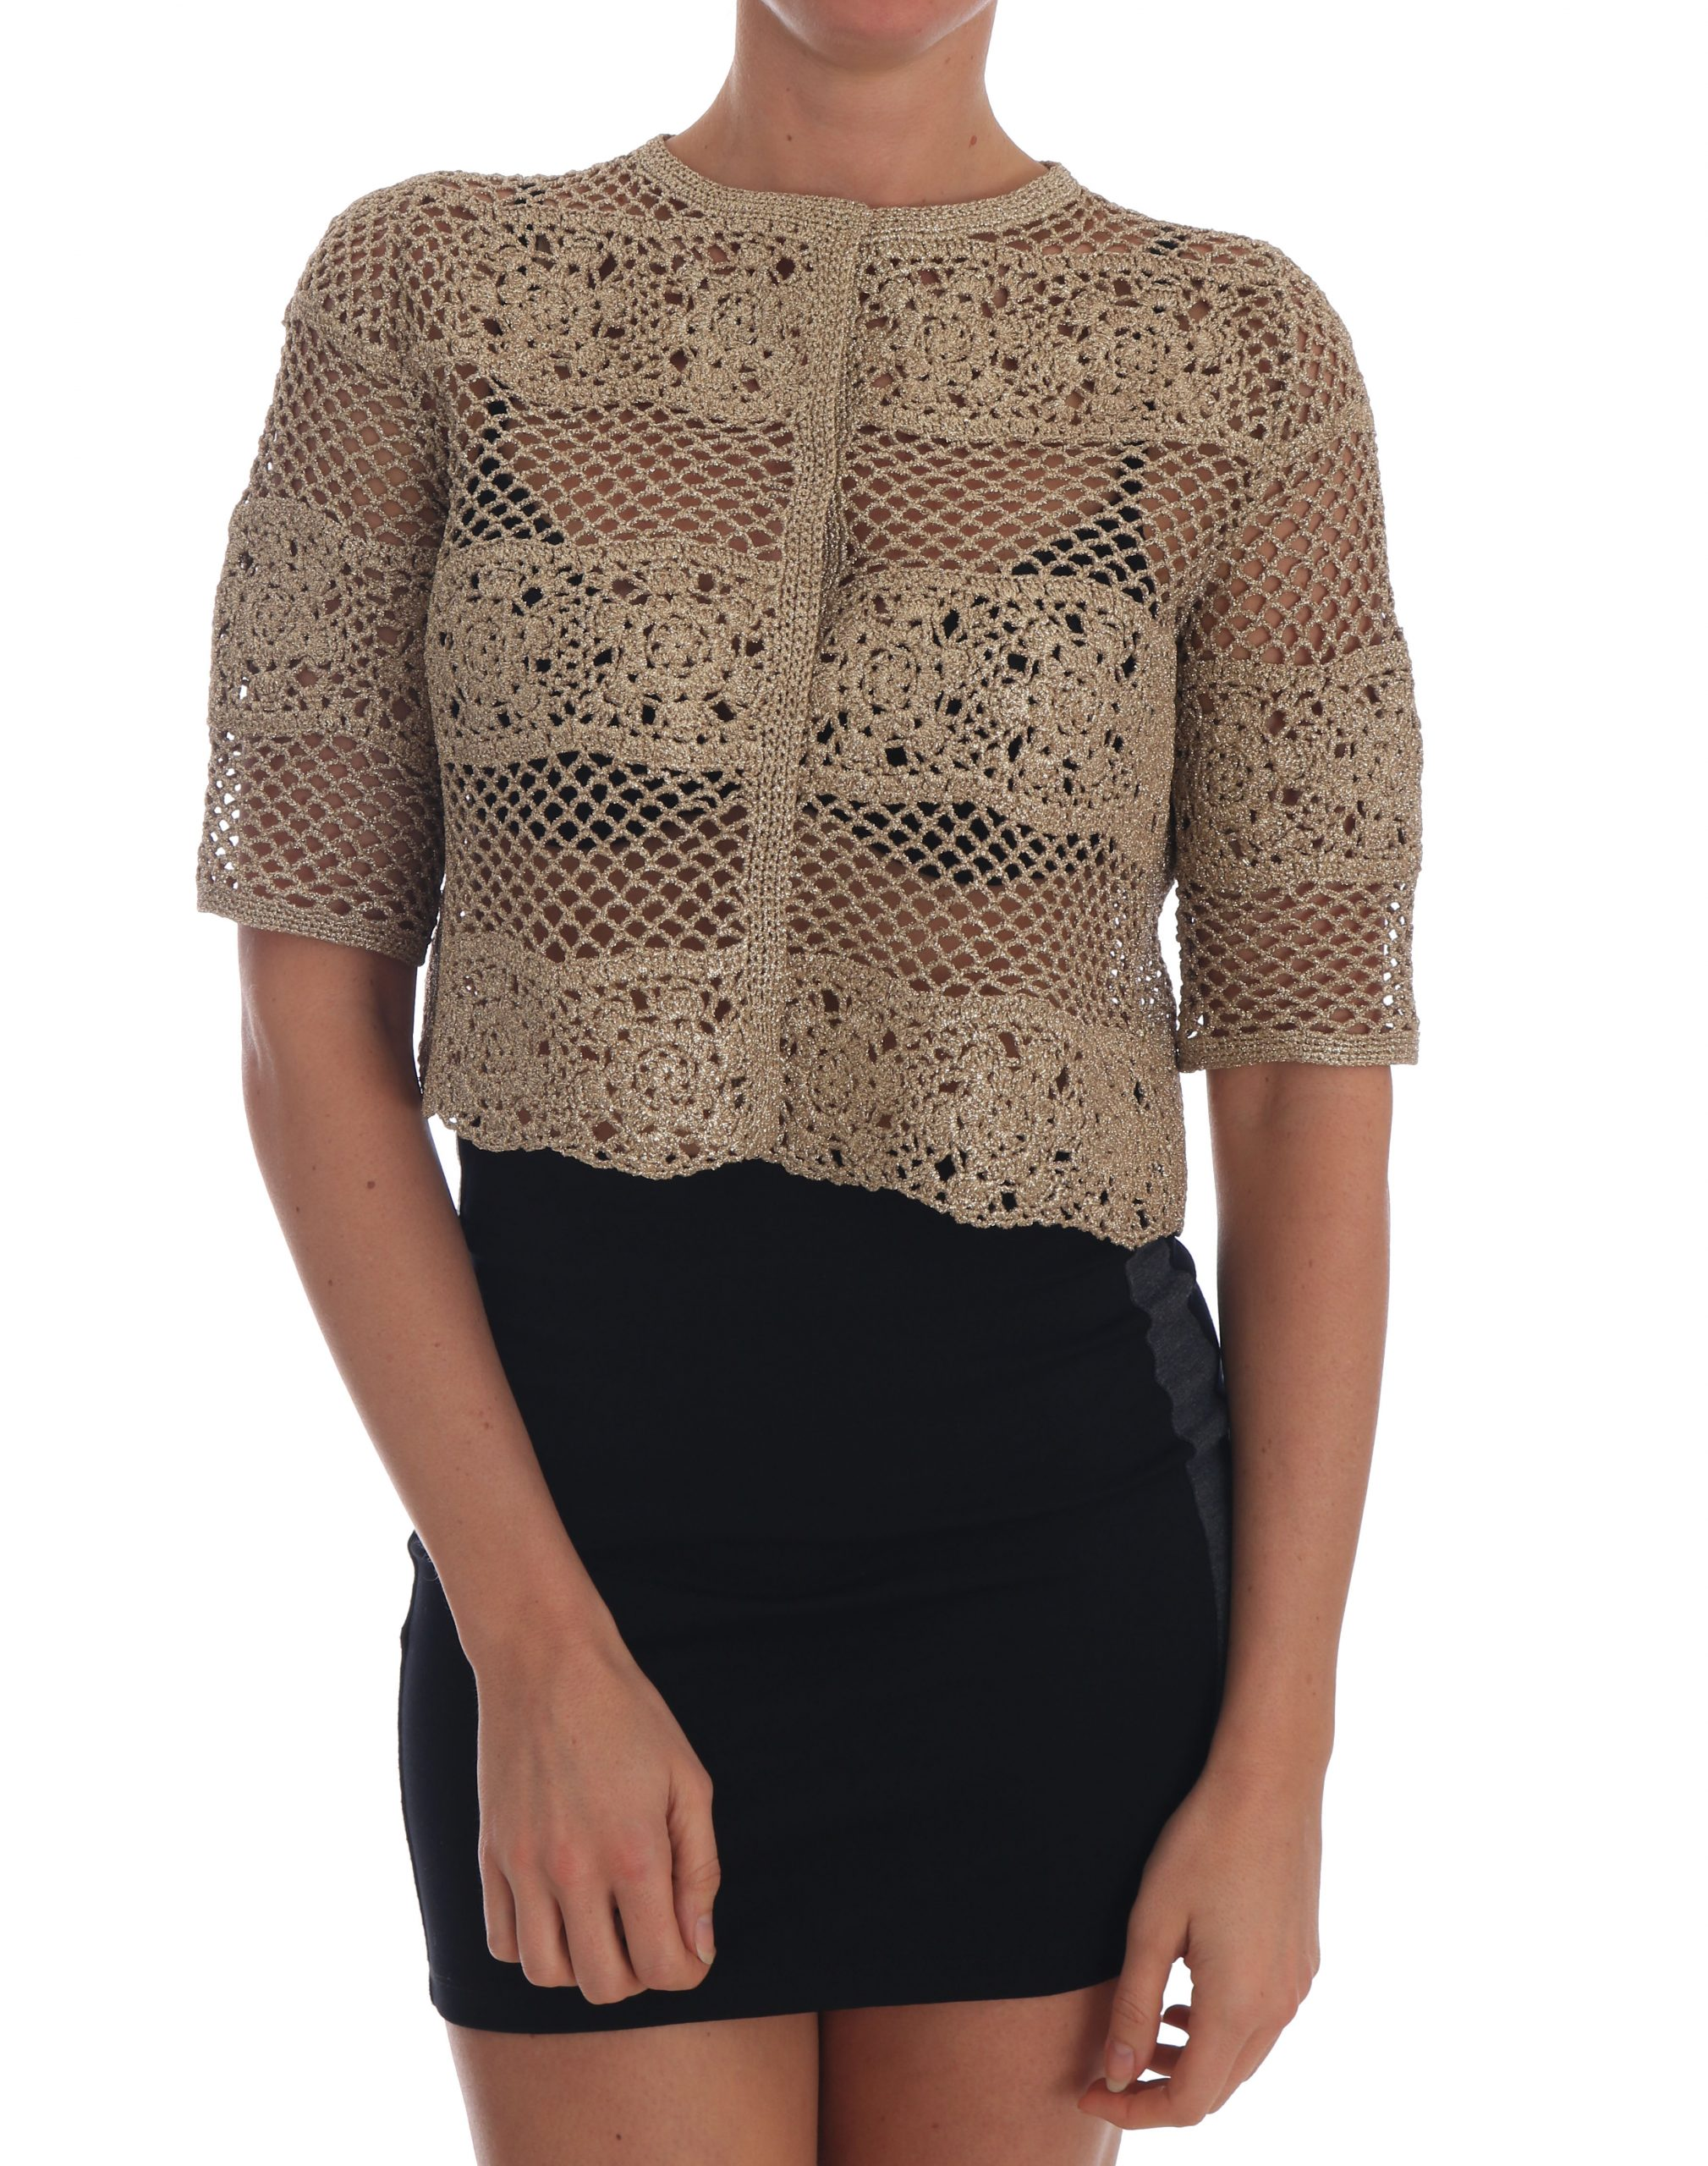 Dolce & Gabbana Women's Crochet Knitted Floral Cardigan Gold TSH1913 - IT40|S